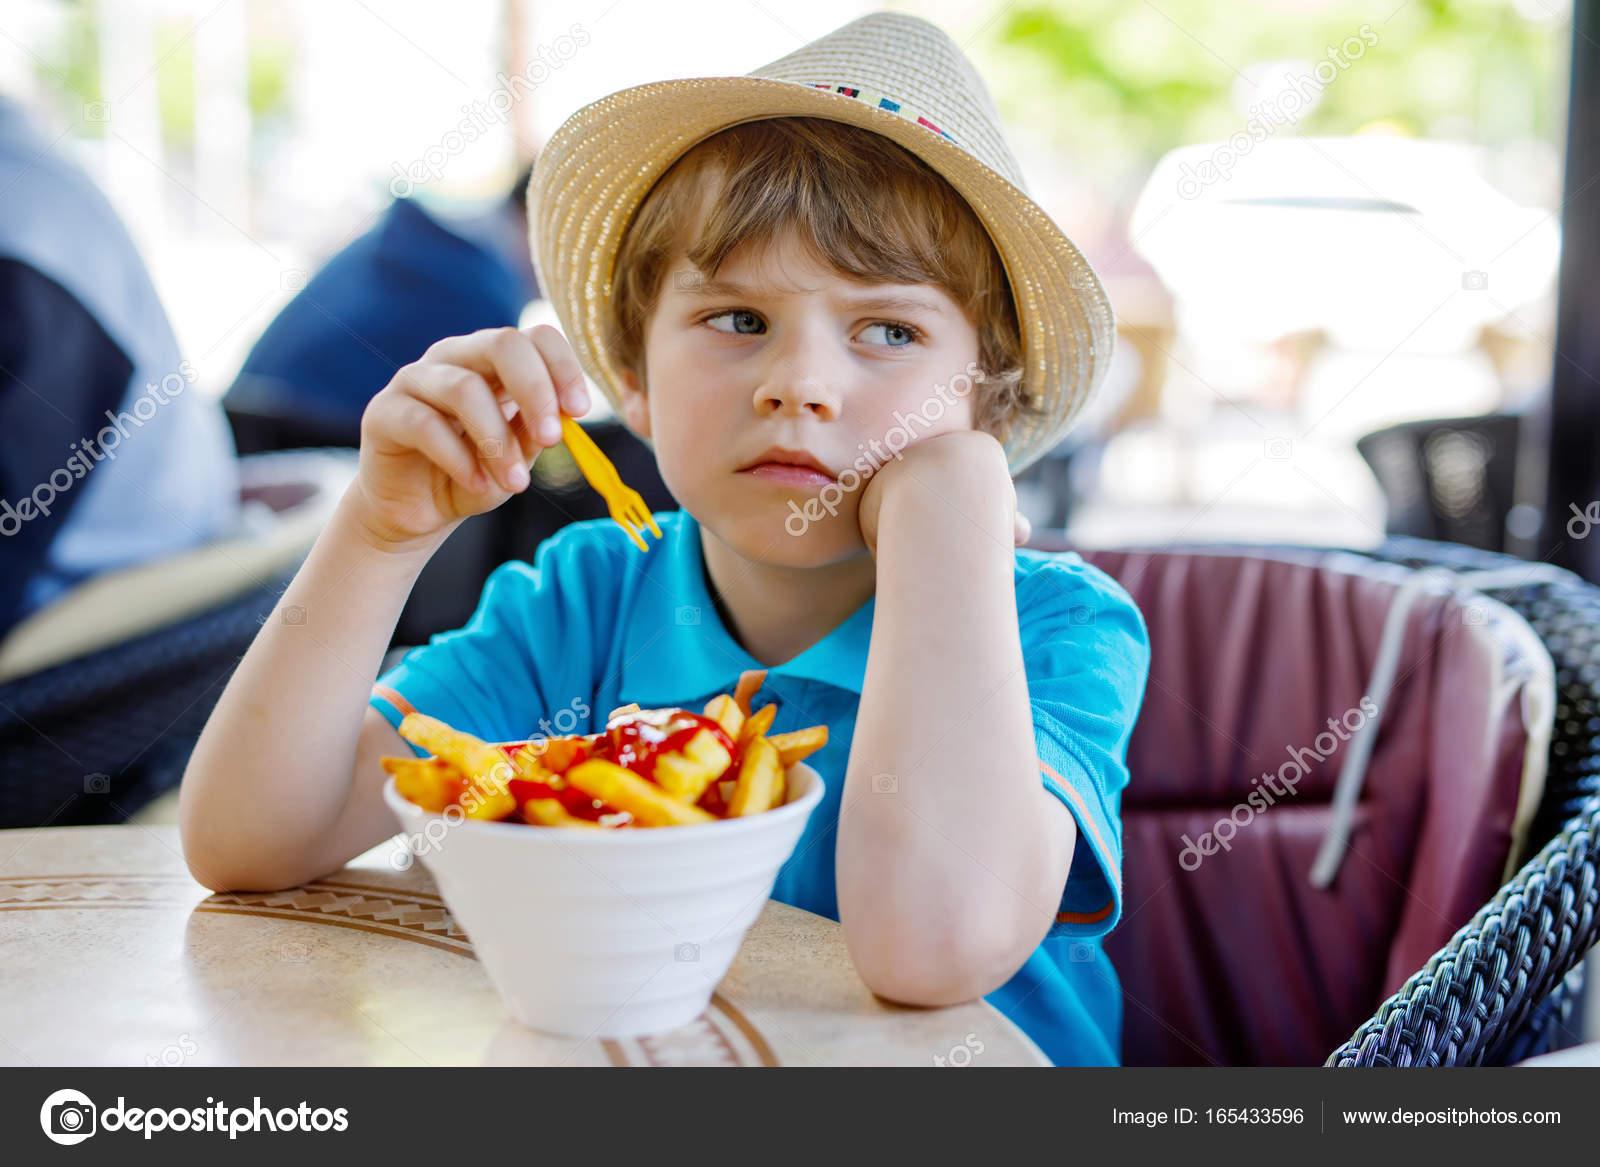 Süße gesunde Vorschule Kind junge isst Kartoffeln Pommes Frites mit ...